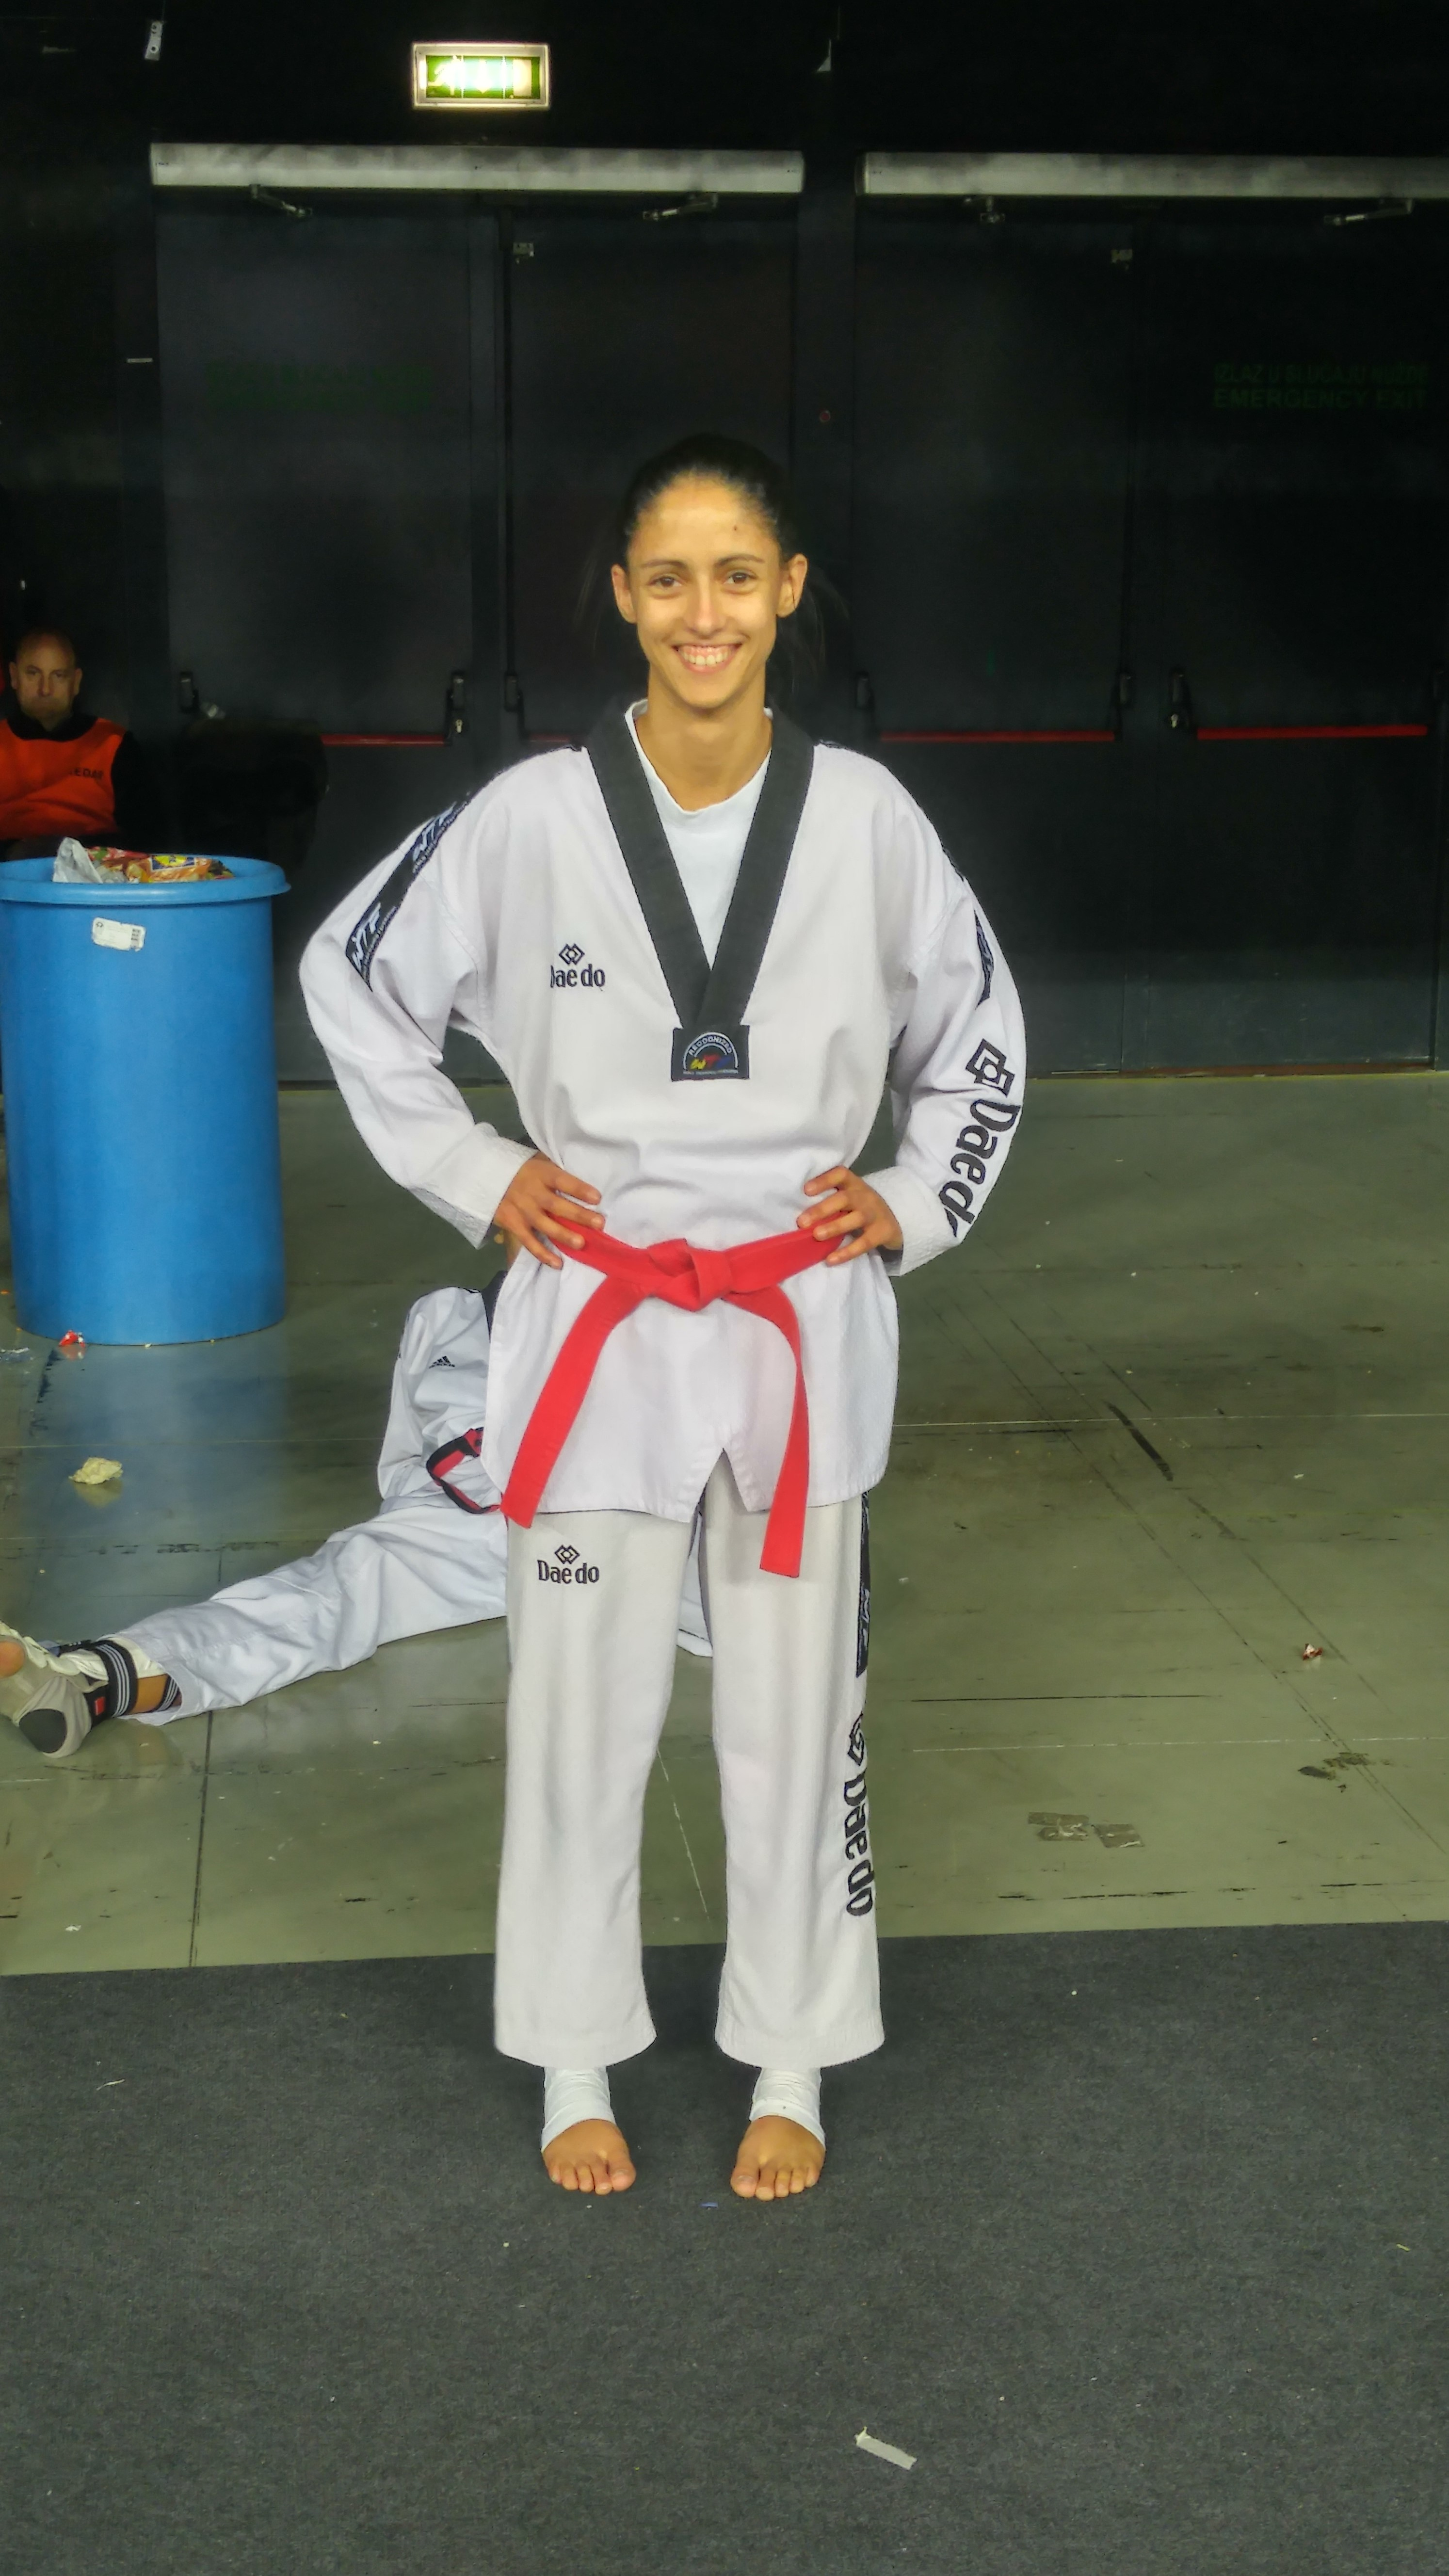 Mihaela Senjak ostvarila prvu pobjedu na G1 turnriu